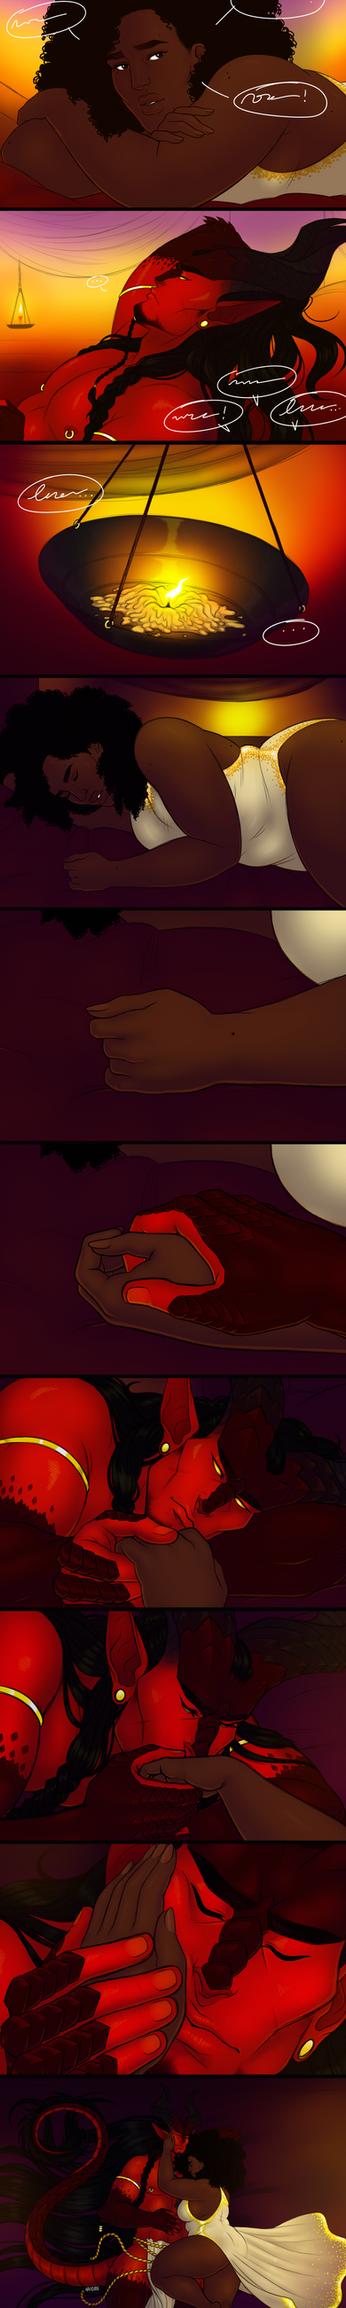 Hands by haodan